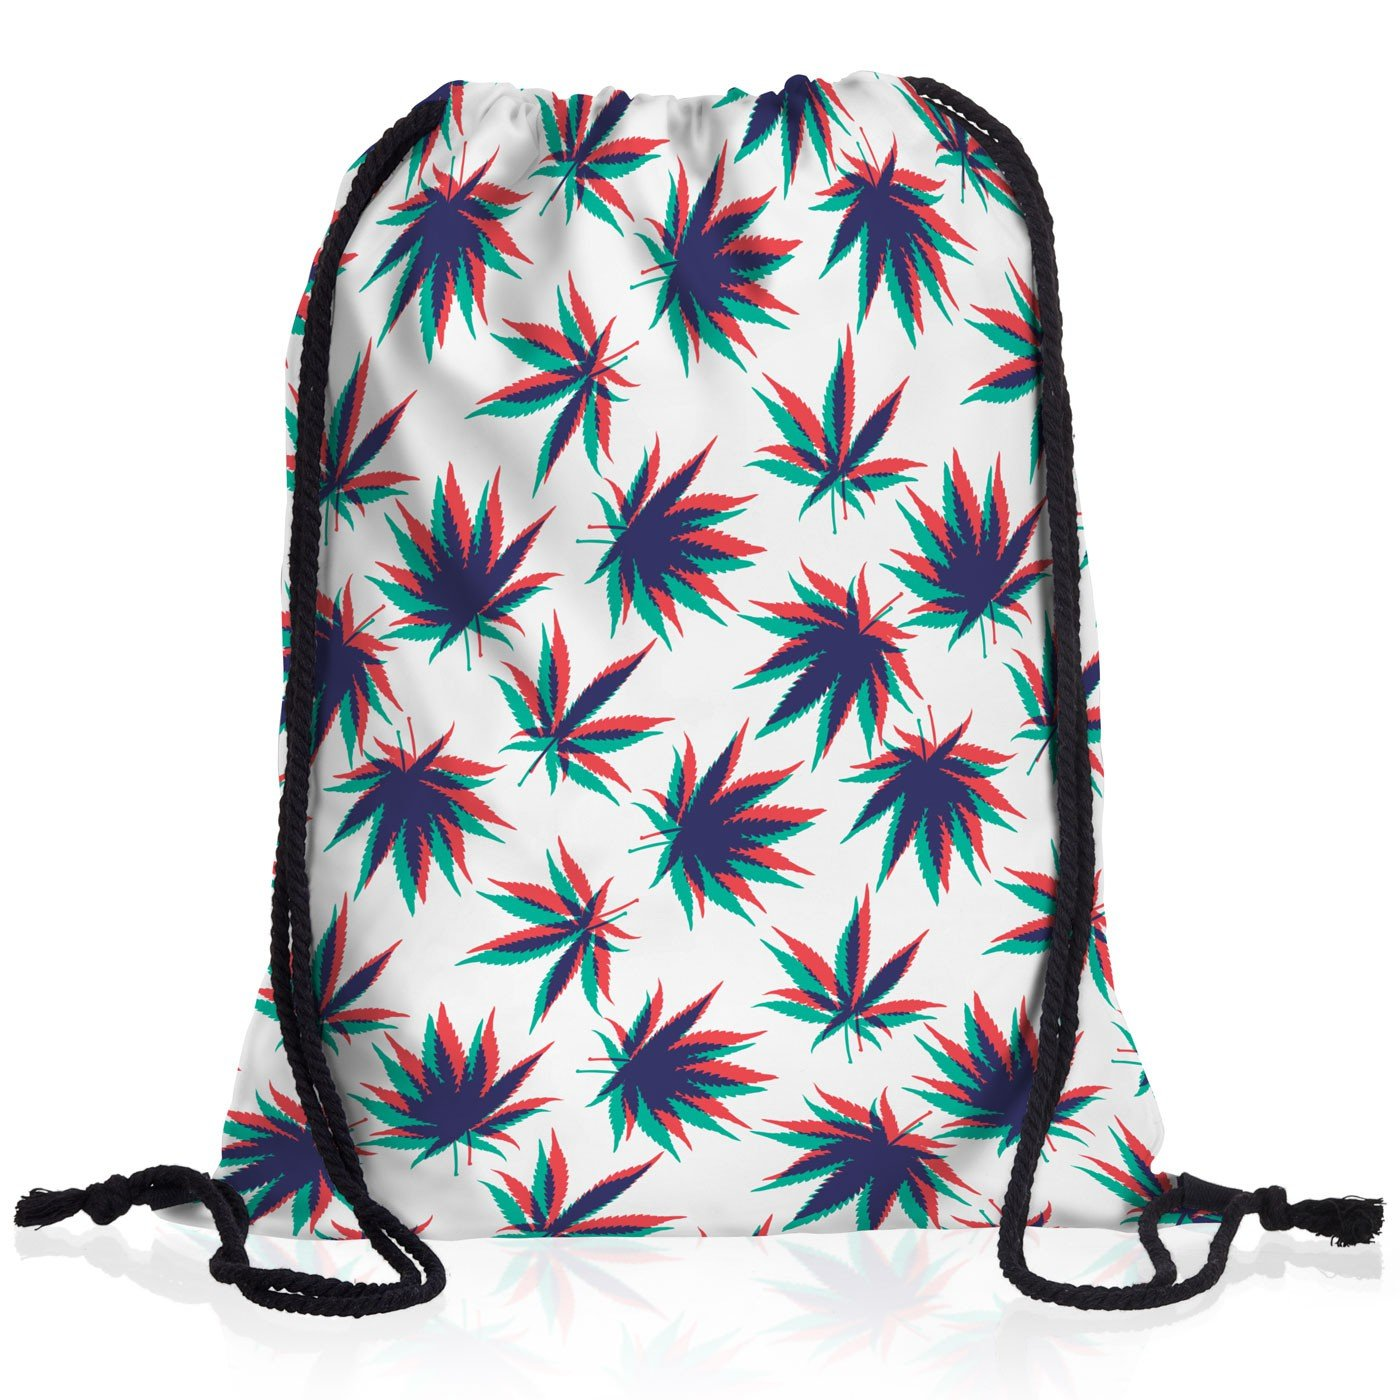 VOID Cannabis Stereo Bolsa Mochila Bolsos Unisex gymsac m/úsica Jamaica grifa Bob Reggae no Woman Marihuana